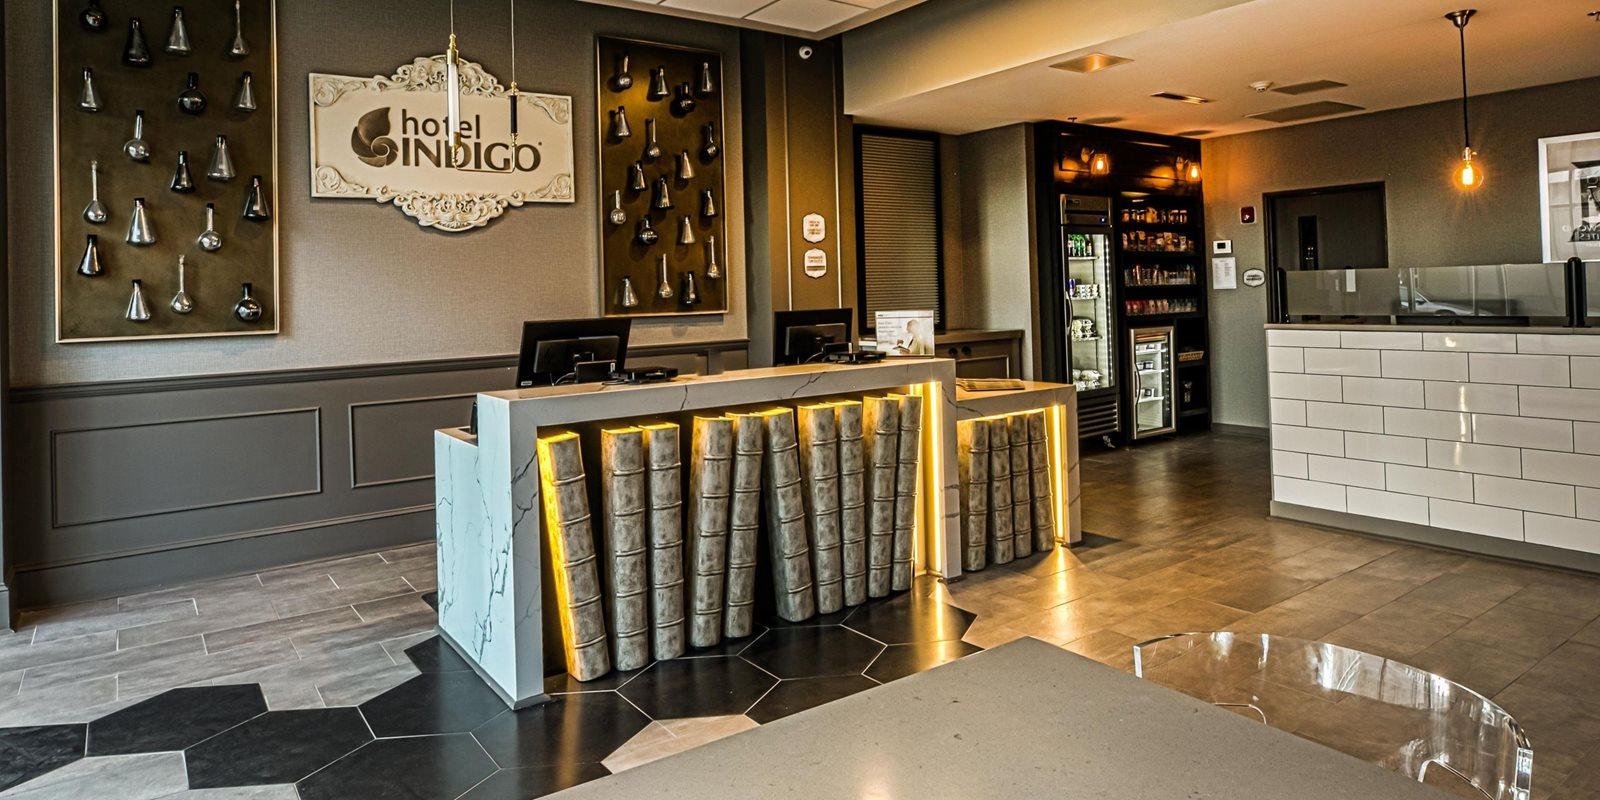 Hotel-Indigo-Birmingham-AL-Front-Desk-(1).jpg